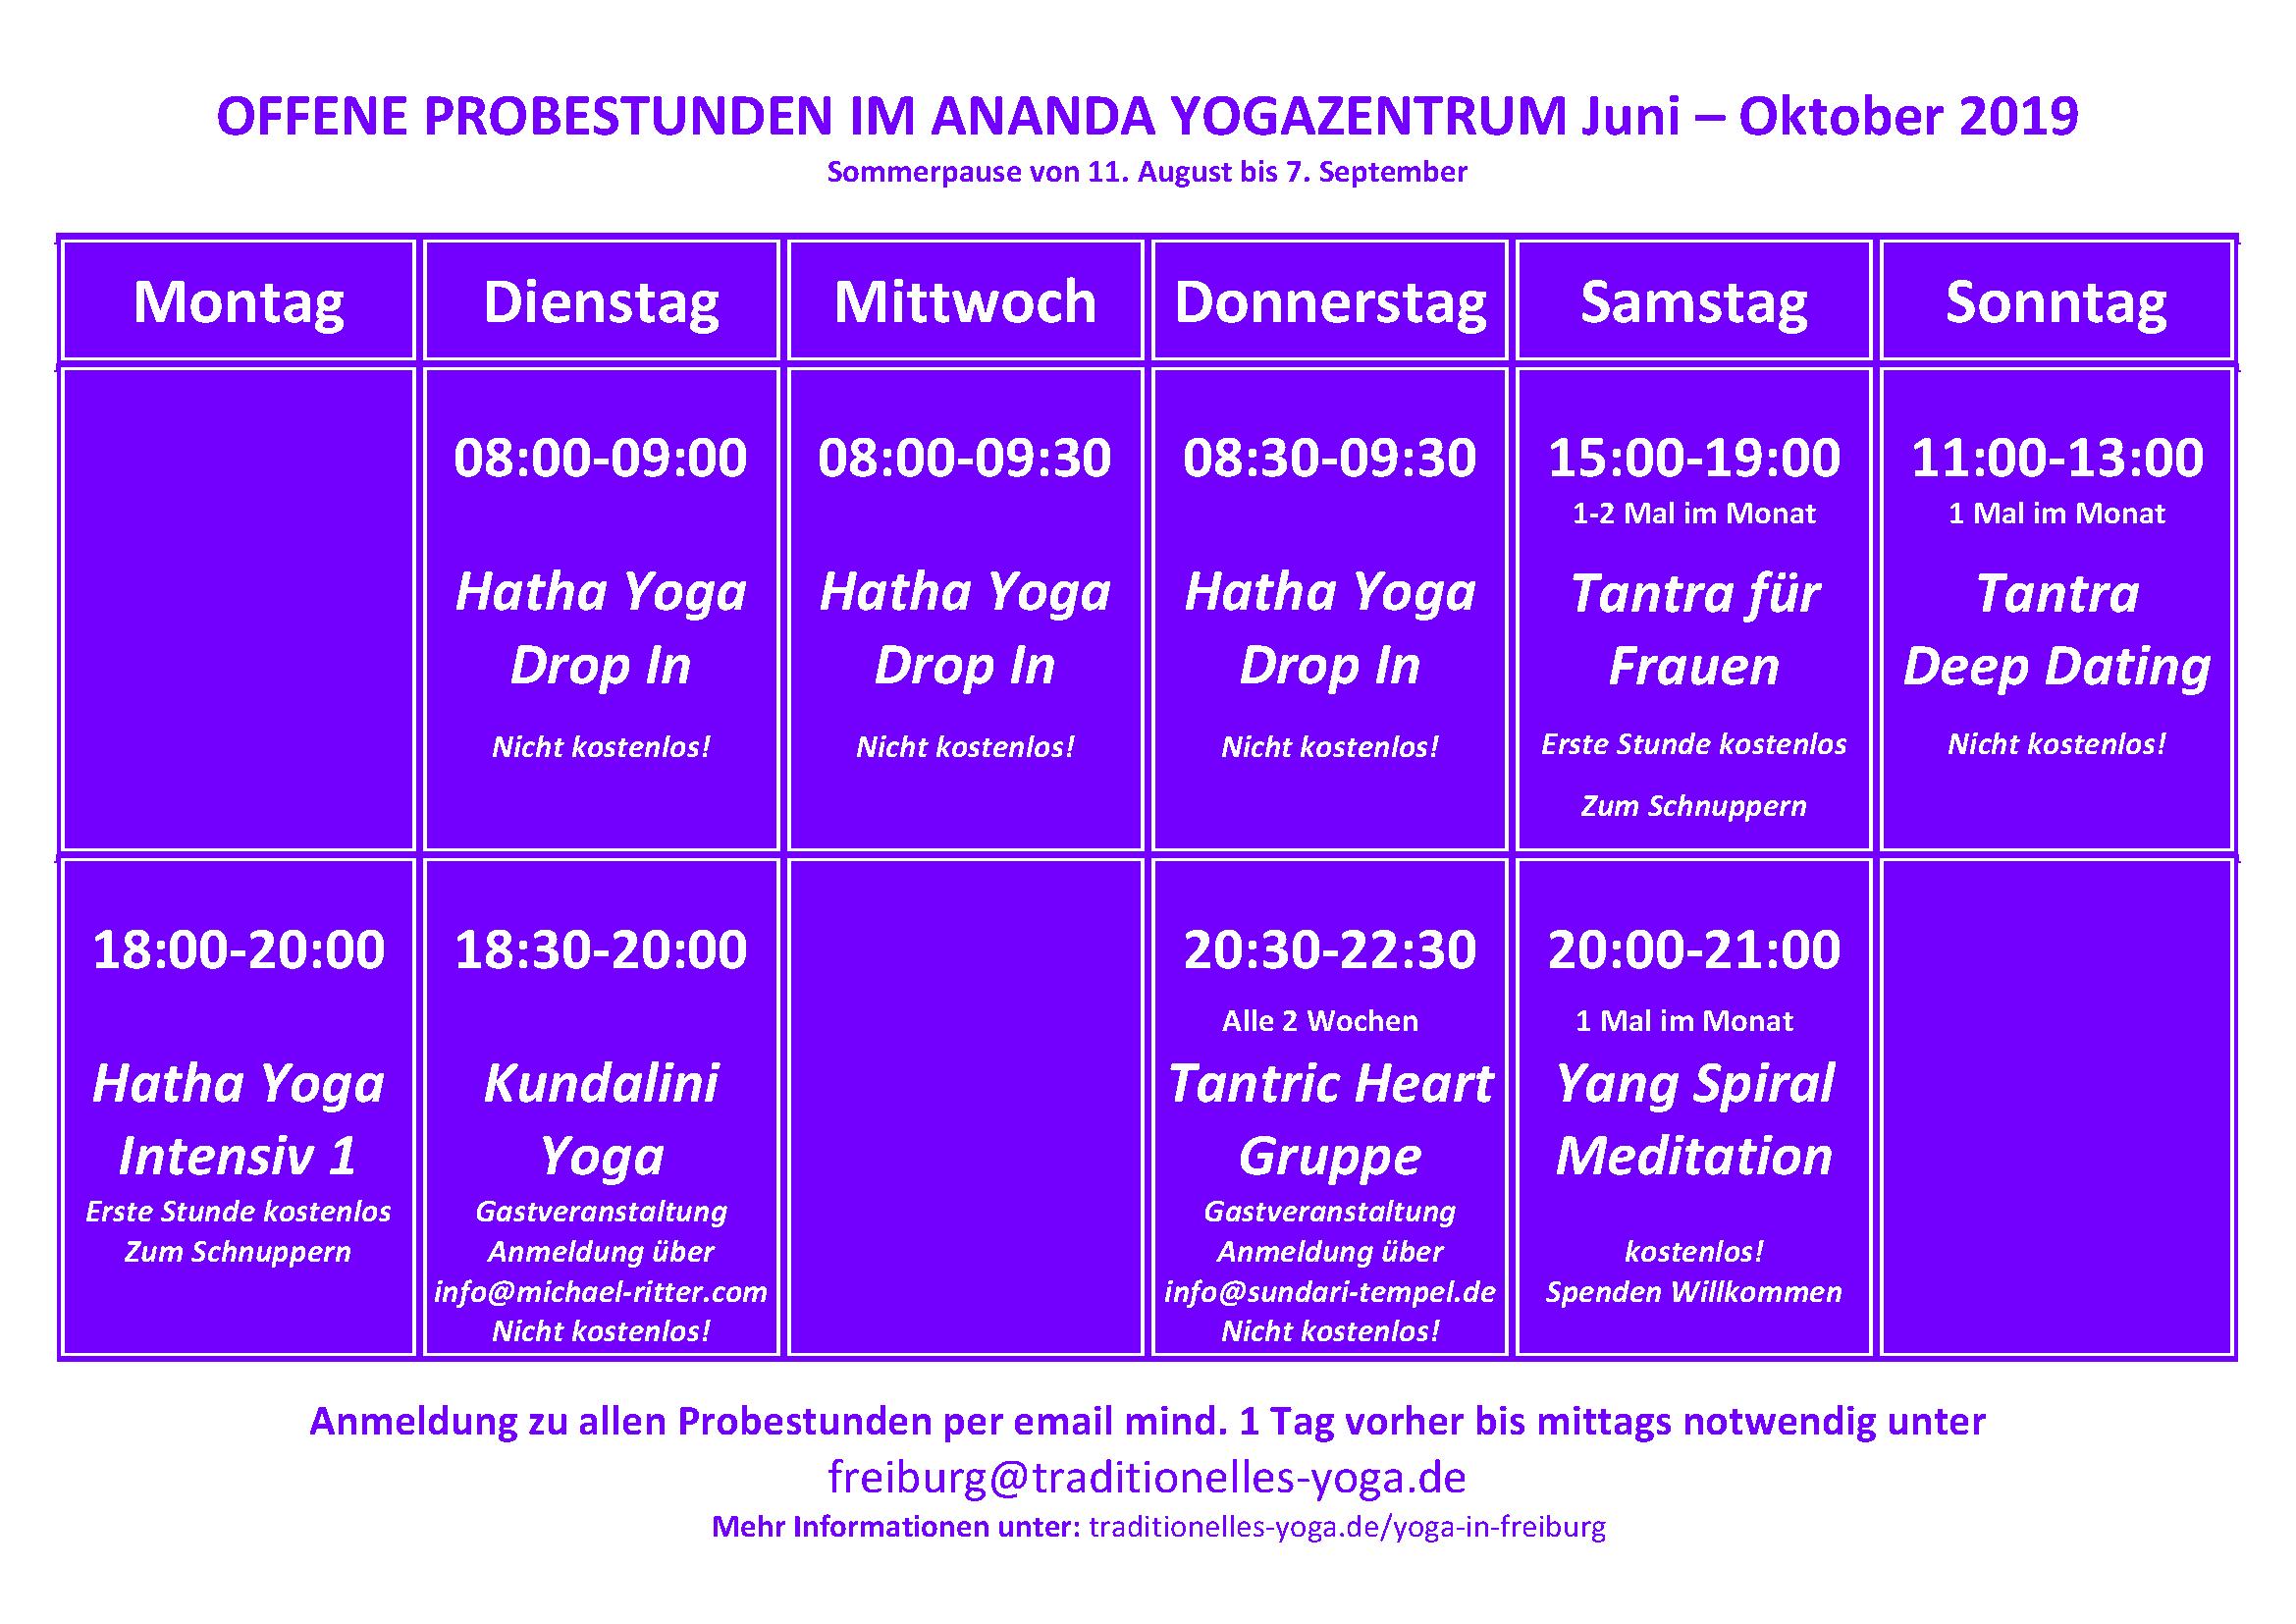 http://traditionelles-yoga.de/wp-content/uploads/Stundenplan-RS-Faltblatt-Version-ab-Juni-2019-NEU.png